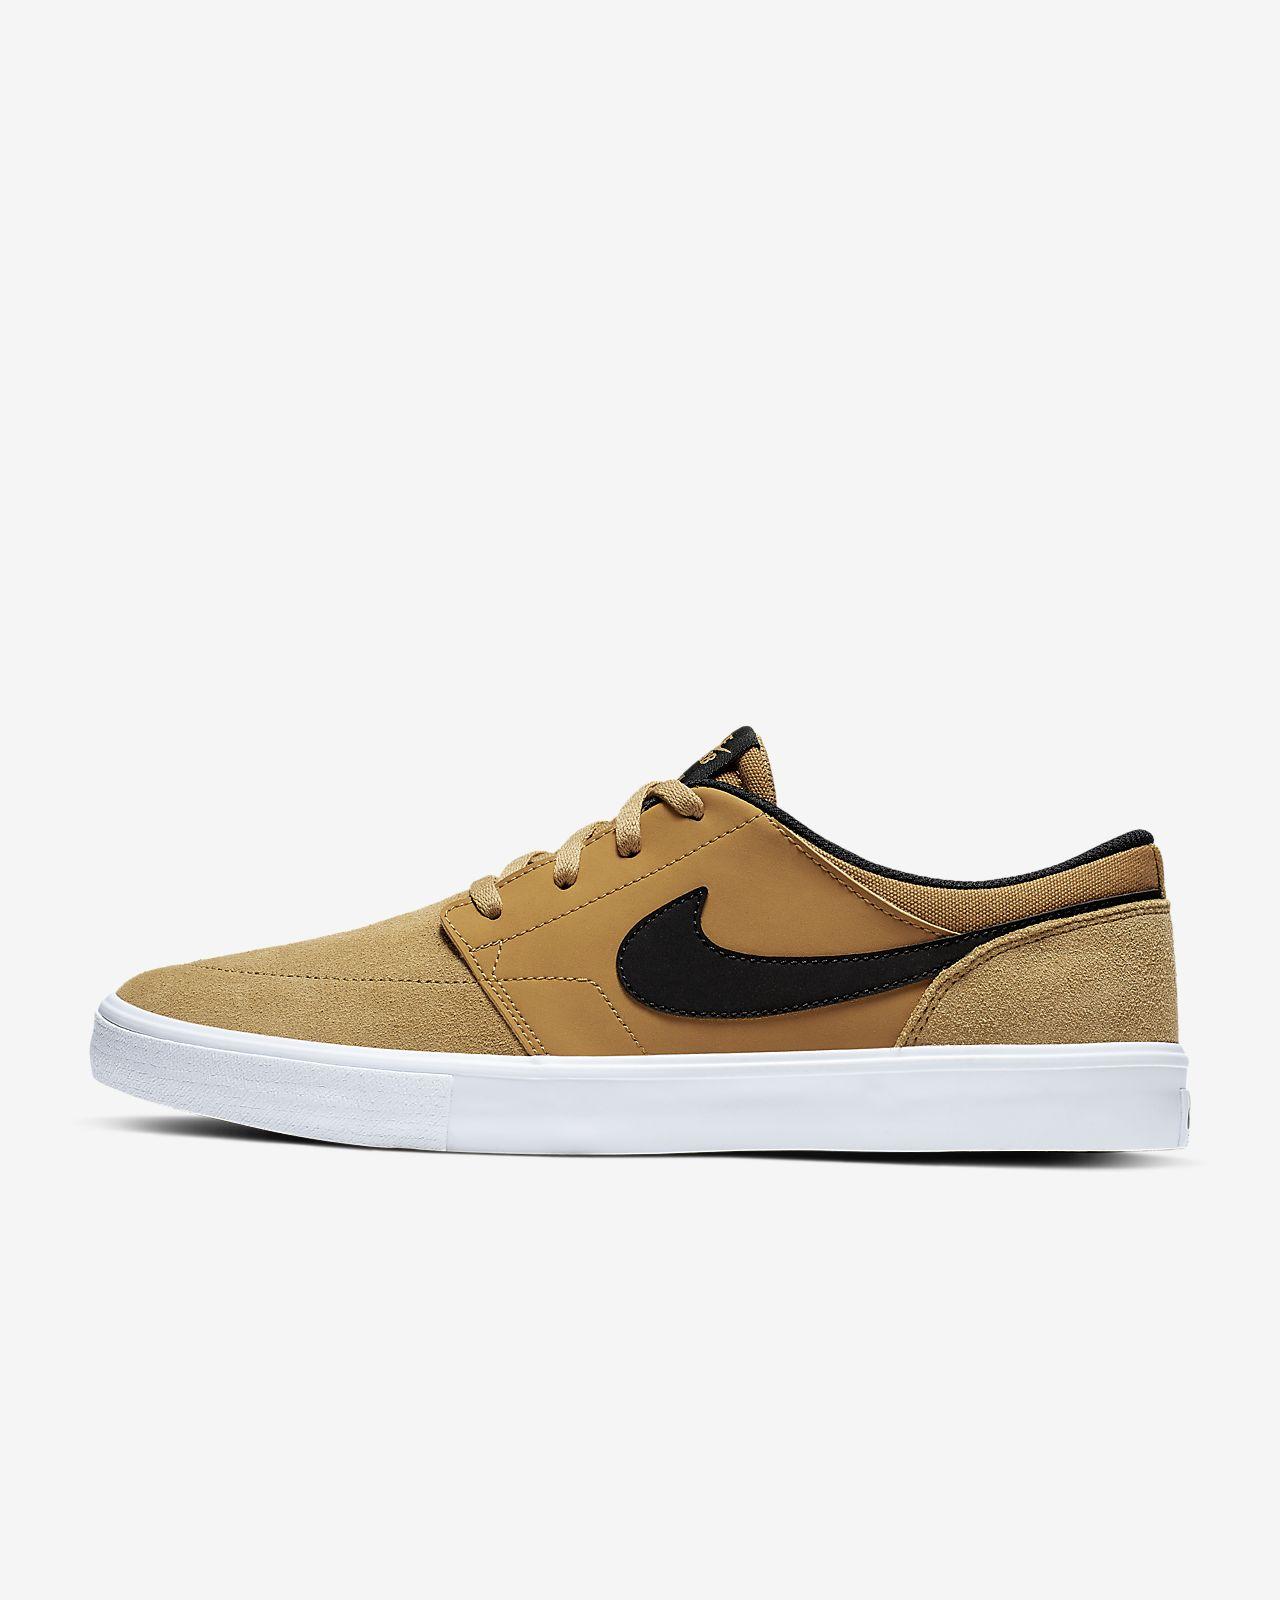 Nike SB Solarsoft Portmore II 男款滑板鞋